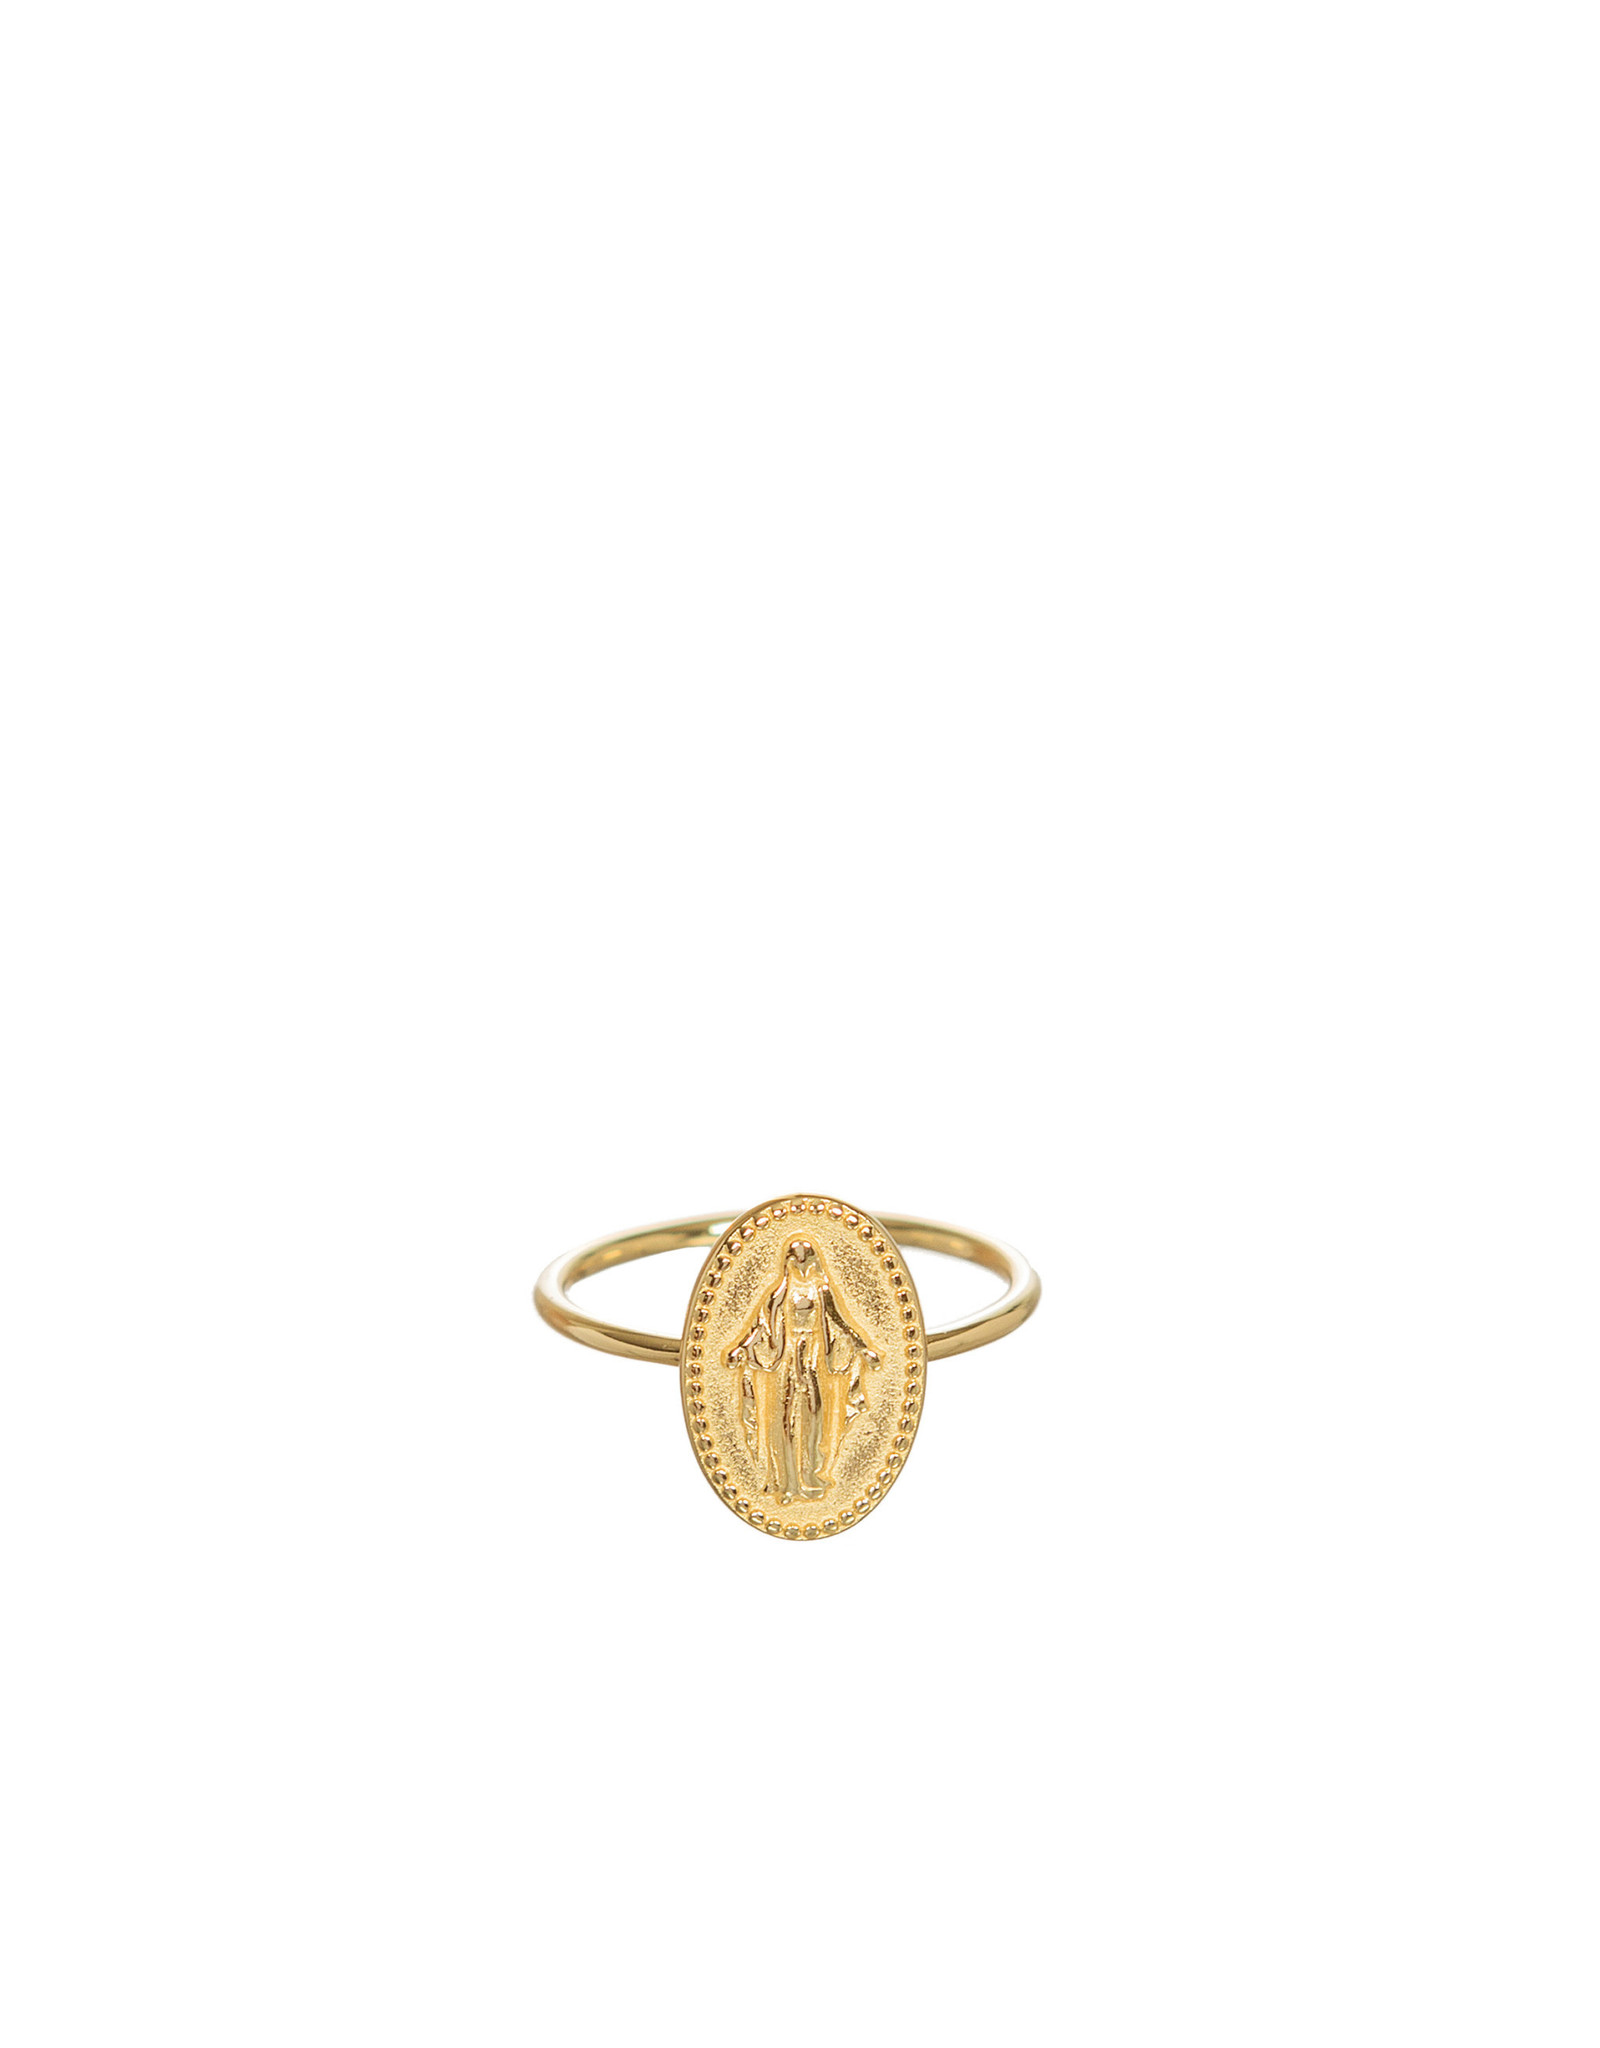 RING CHLOE MARY GOLD